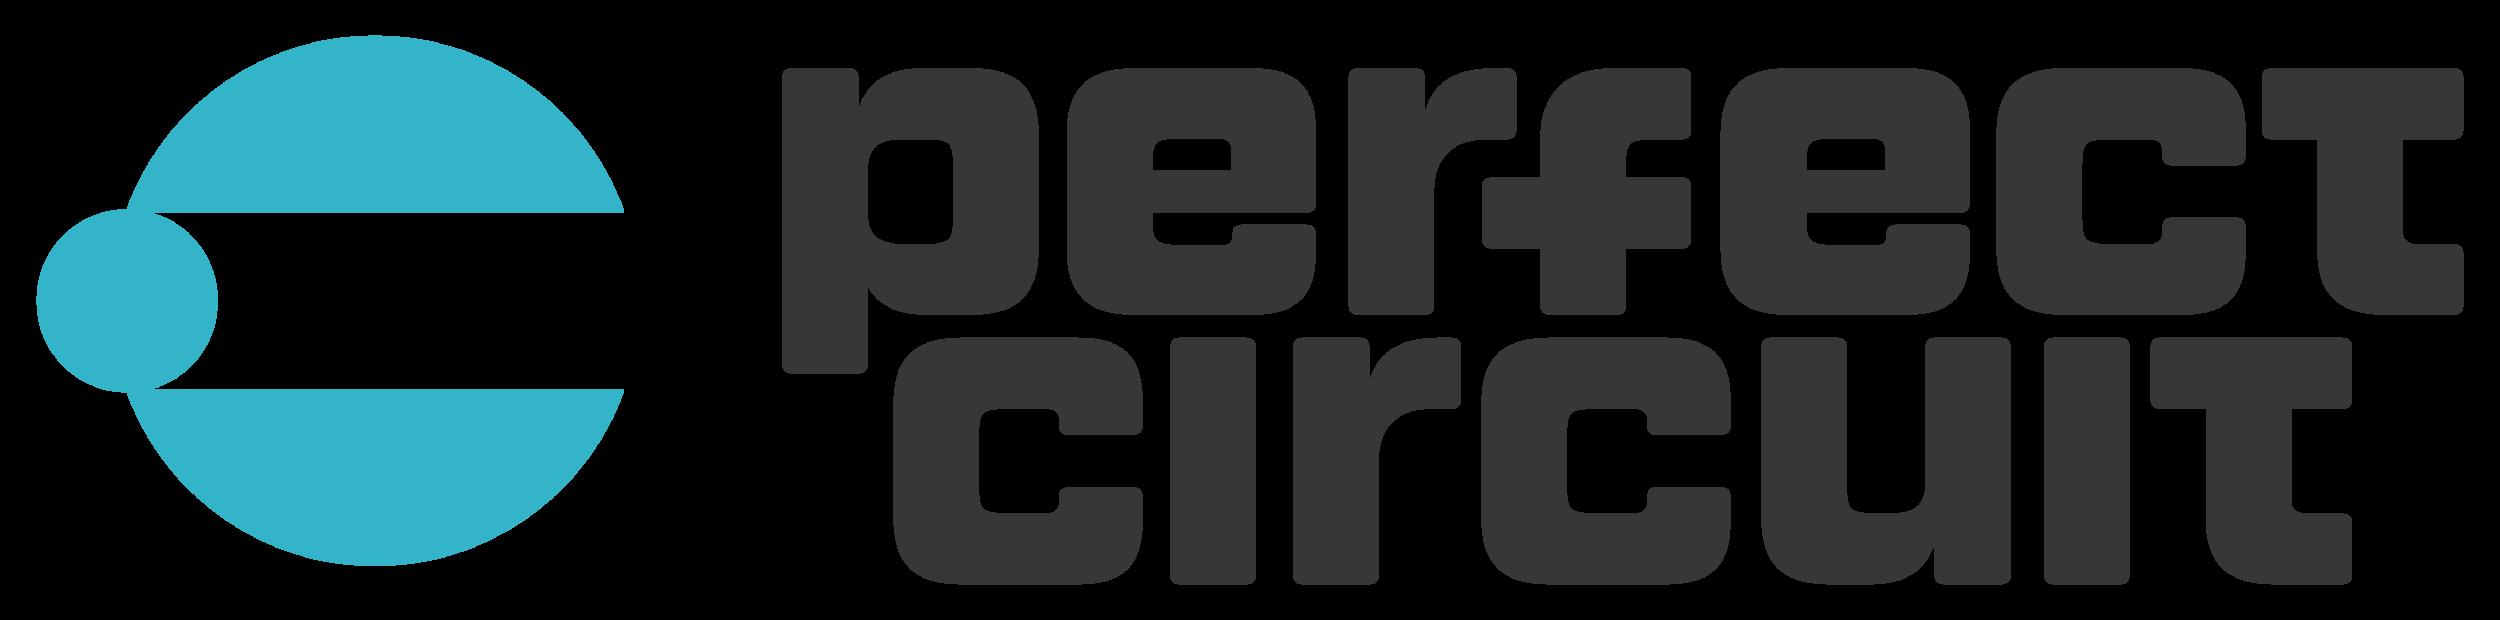 perfectcircuit_logo_h_rgb.png